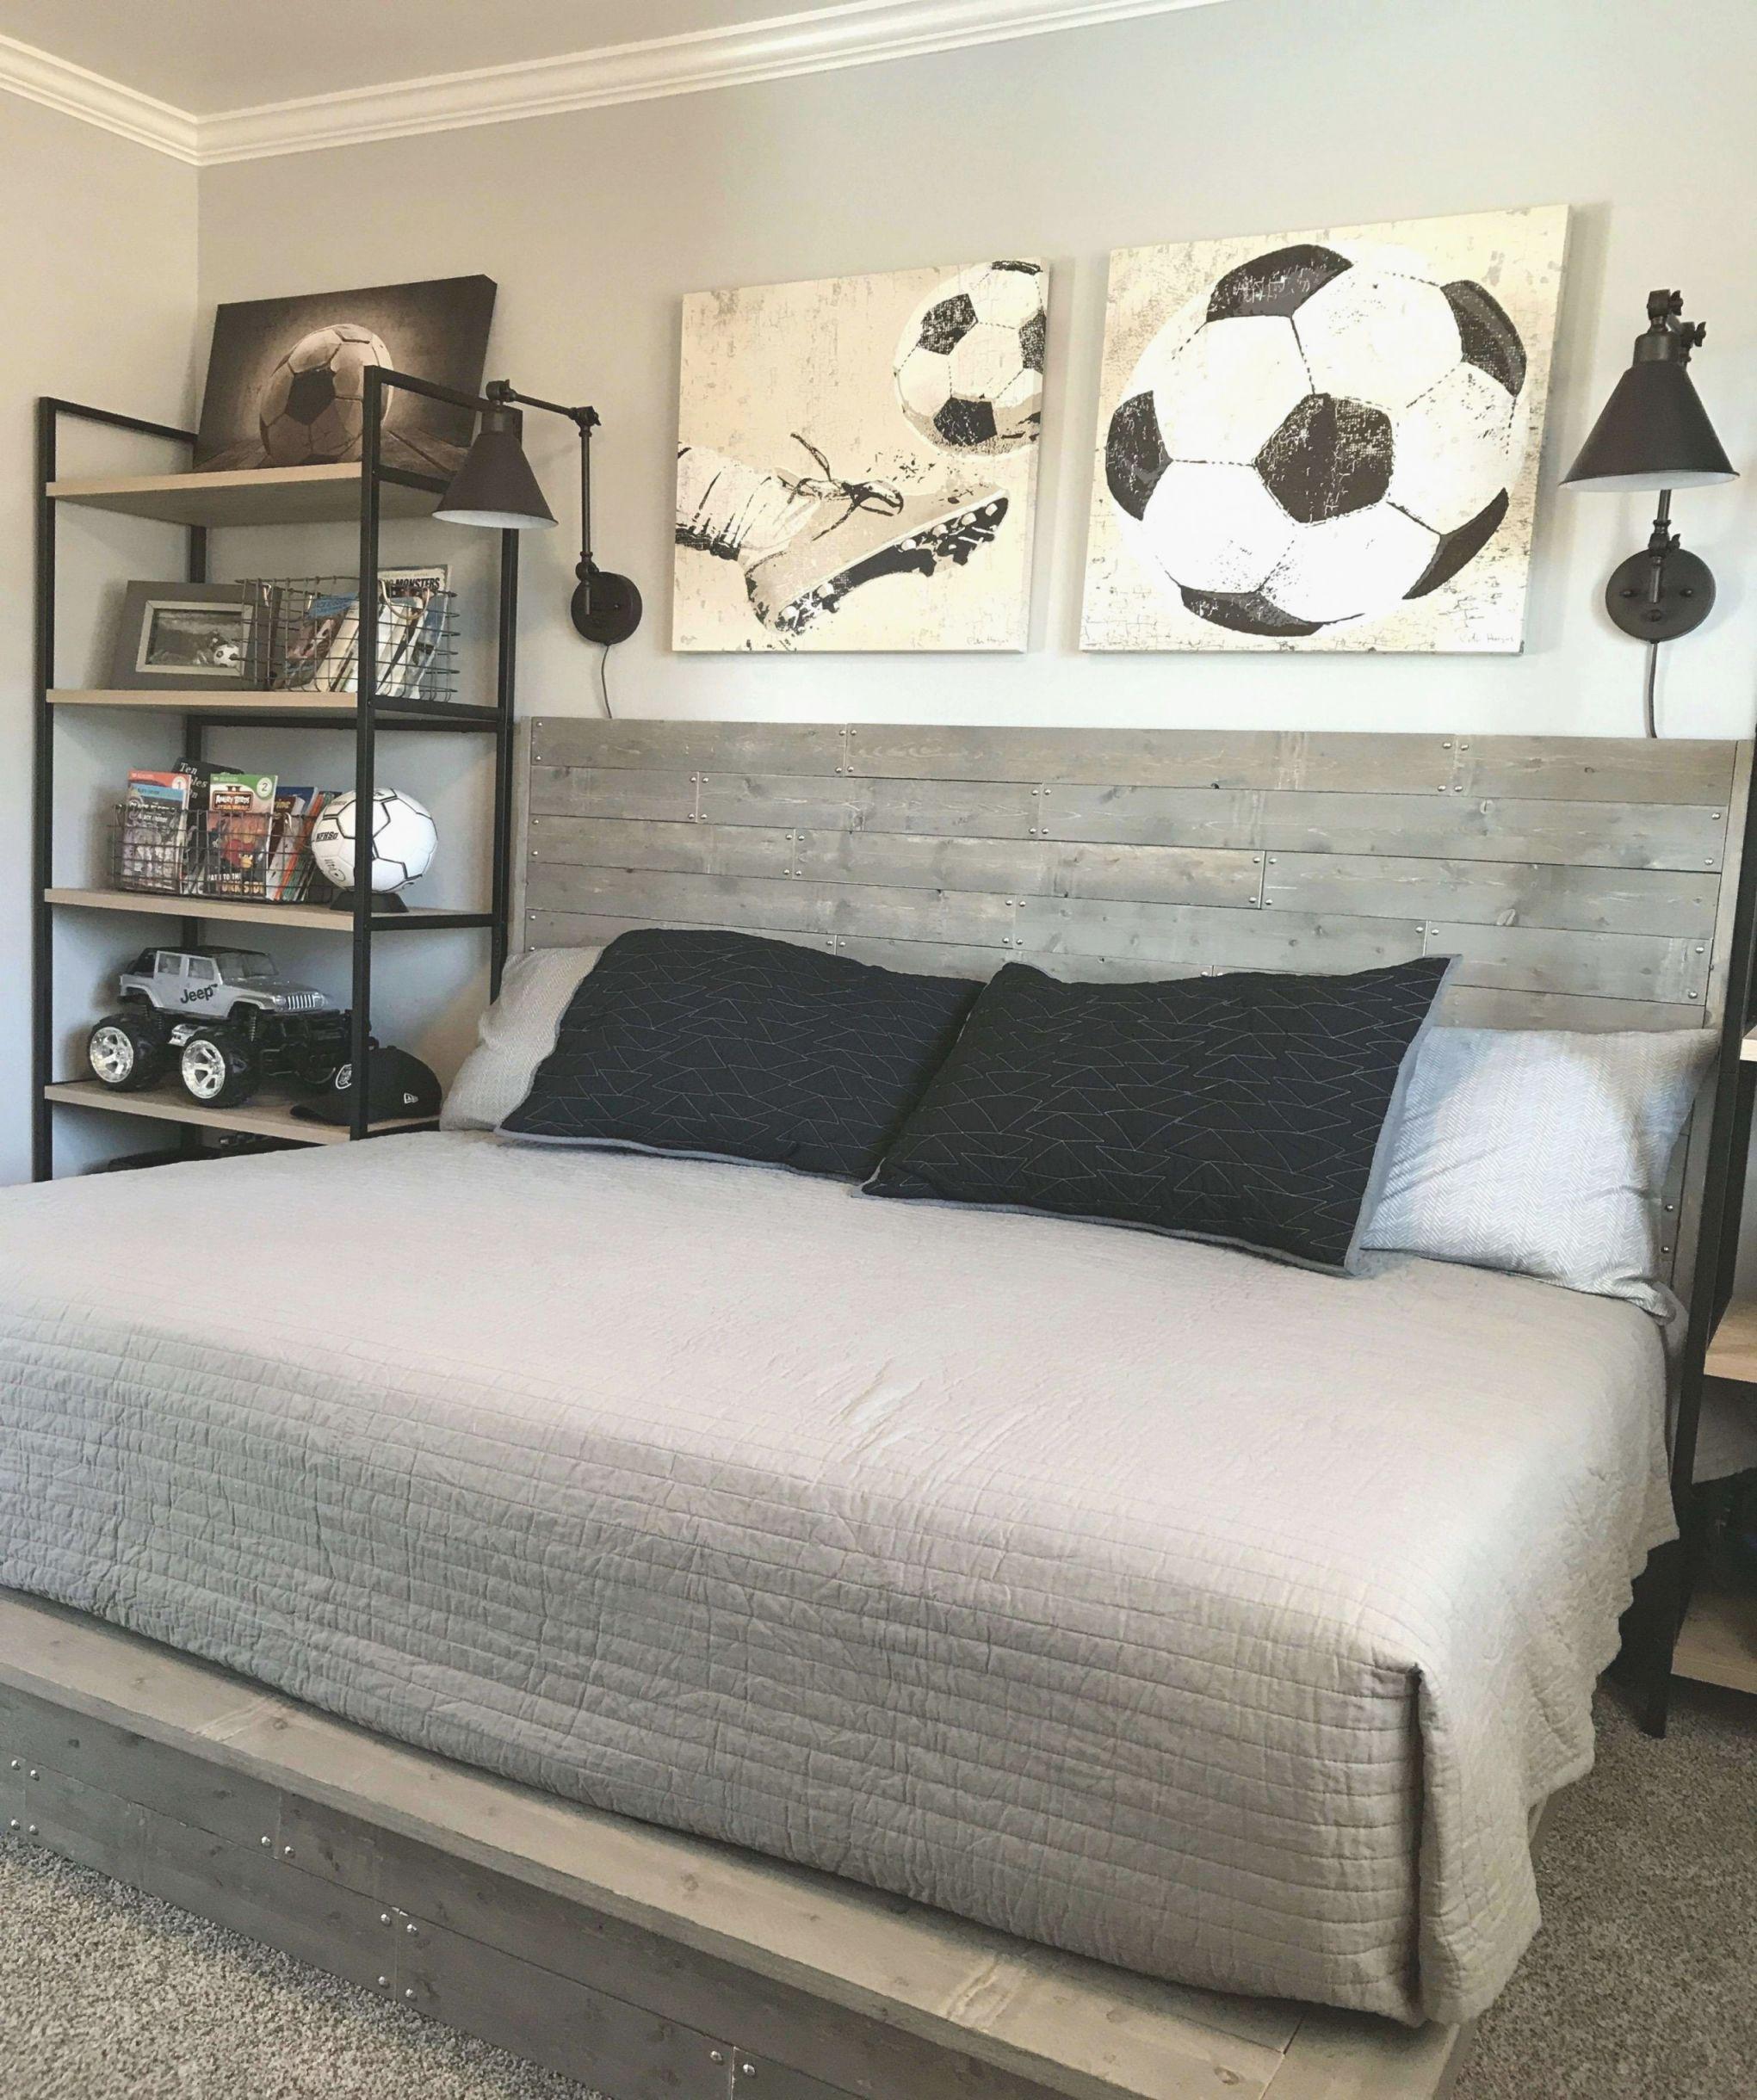 Cabin Loft Ideas Twin Room Decorating Ideas for Inspirational Cabin Bedroom Decorating Ideas